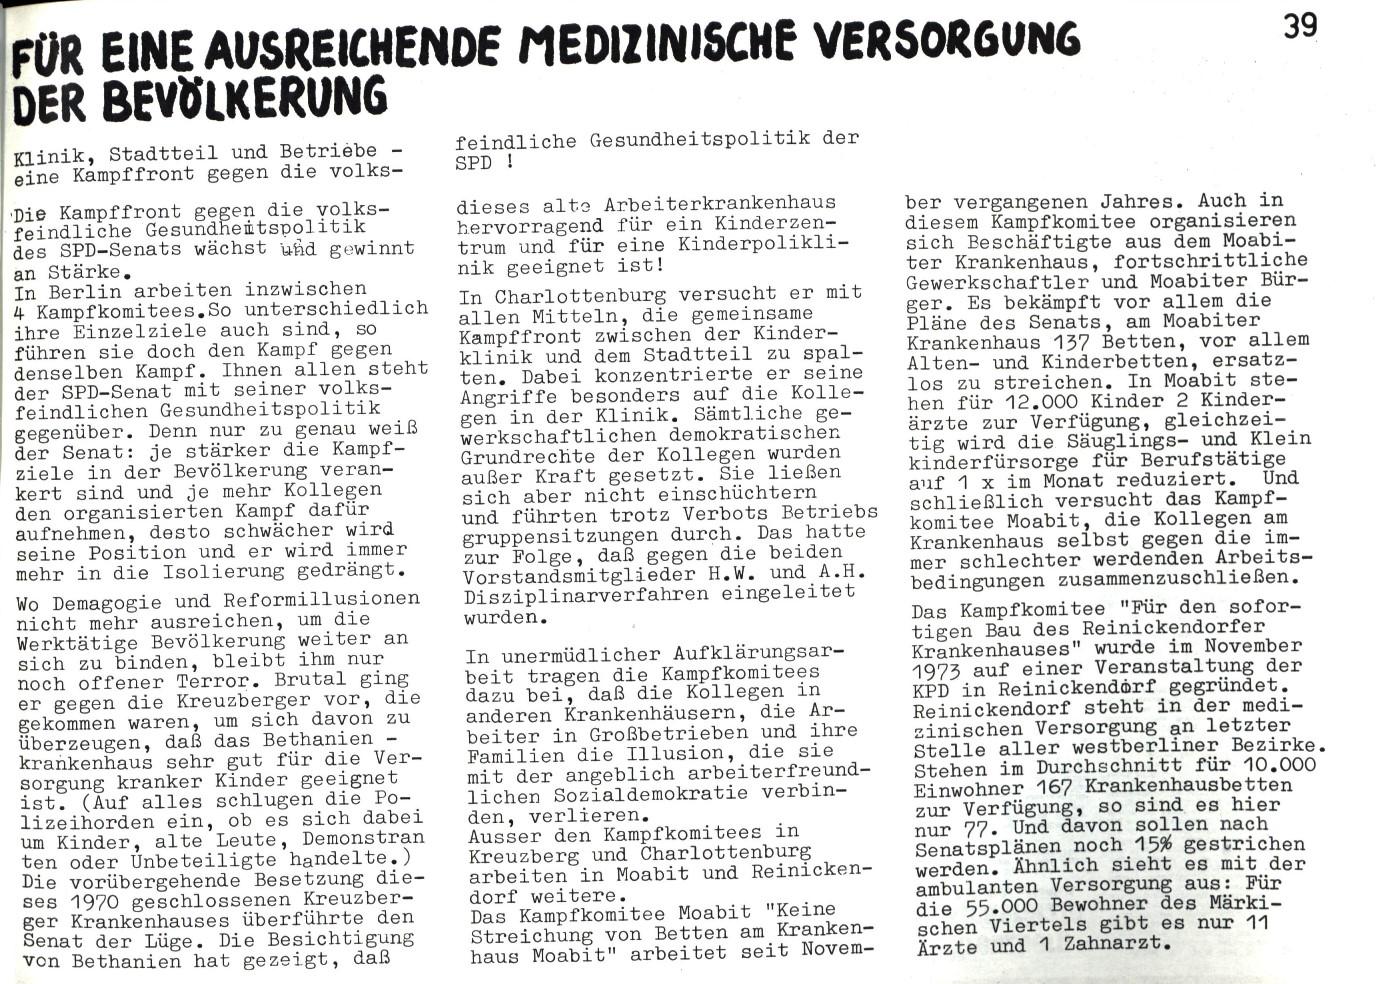 Berlin_KSV_1974_Rote_Bauwochen_54